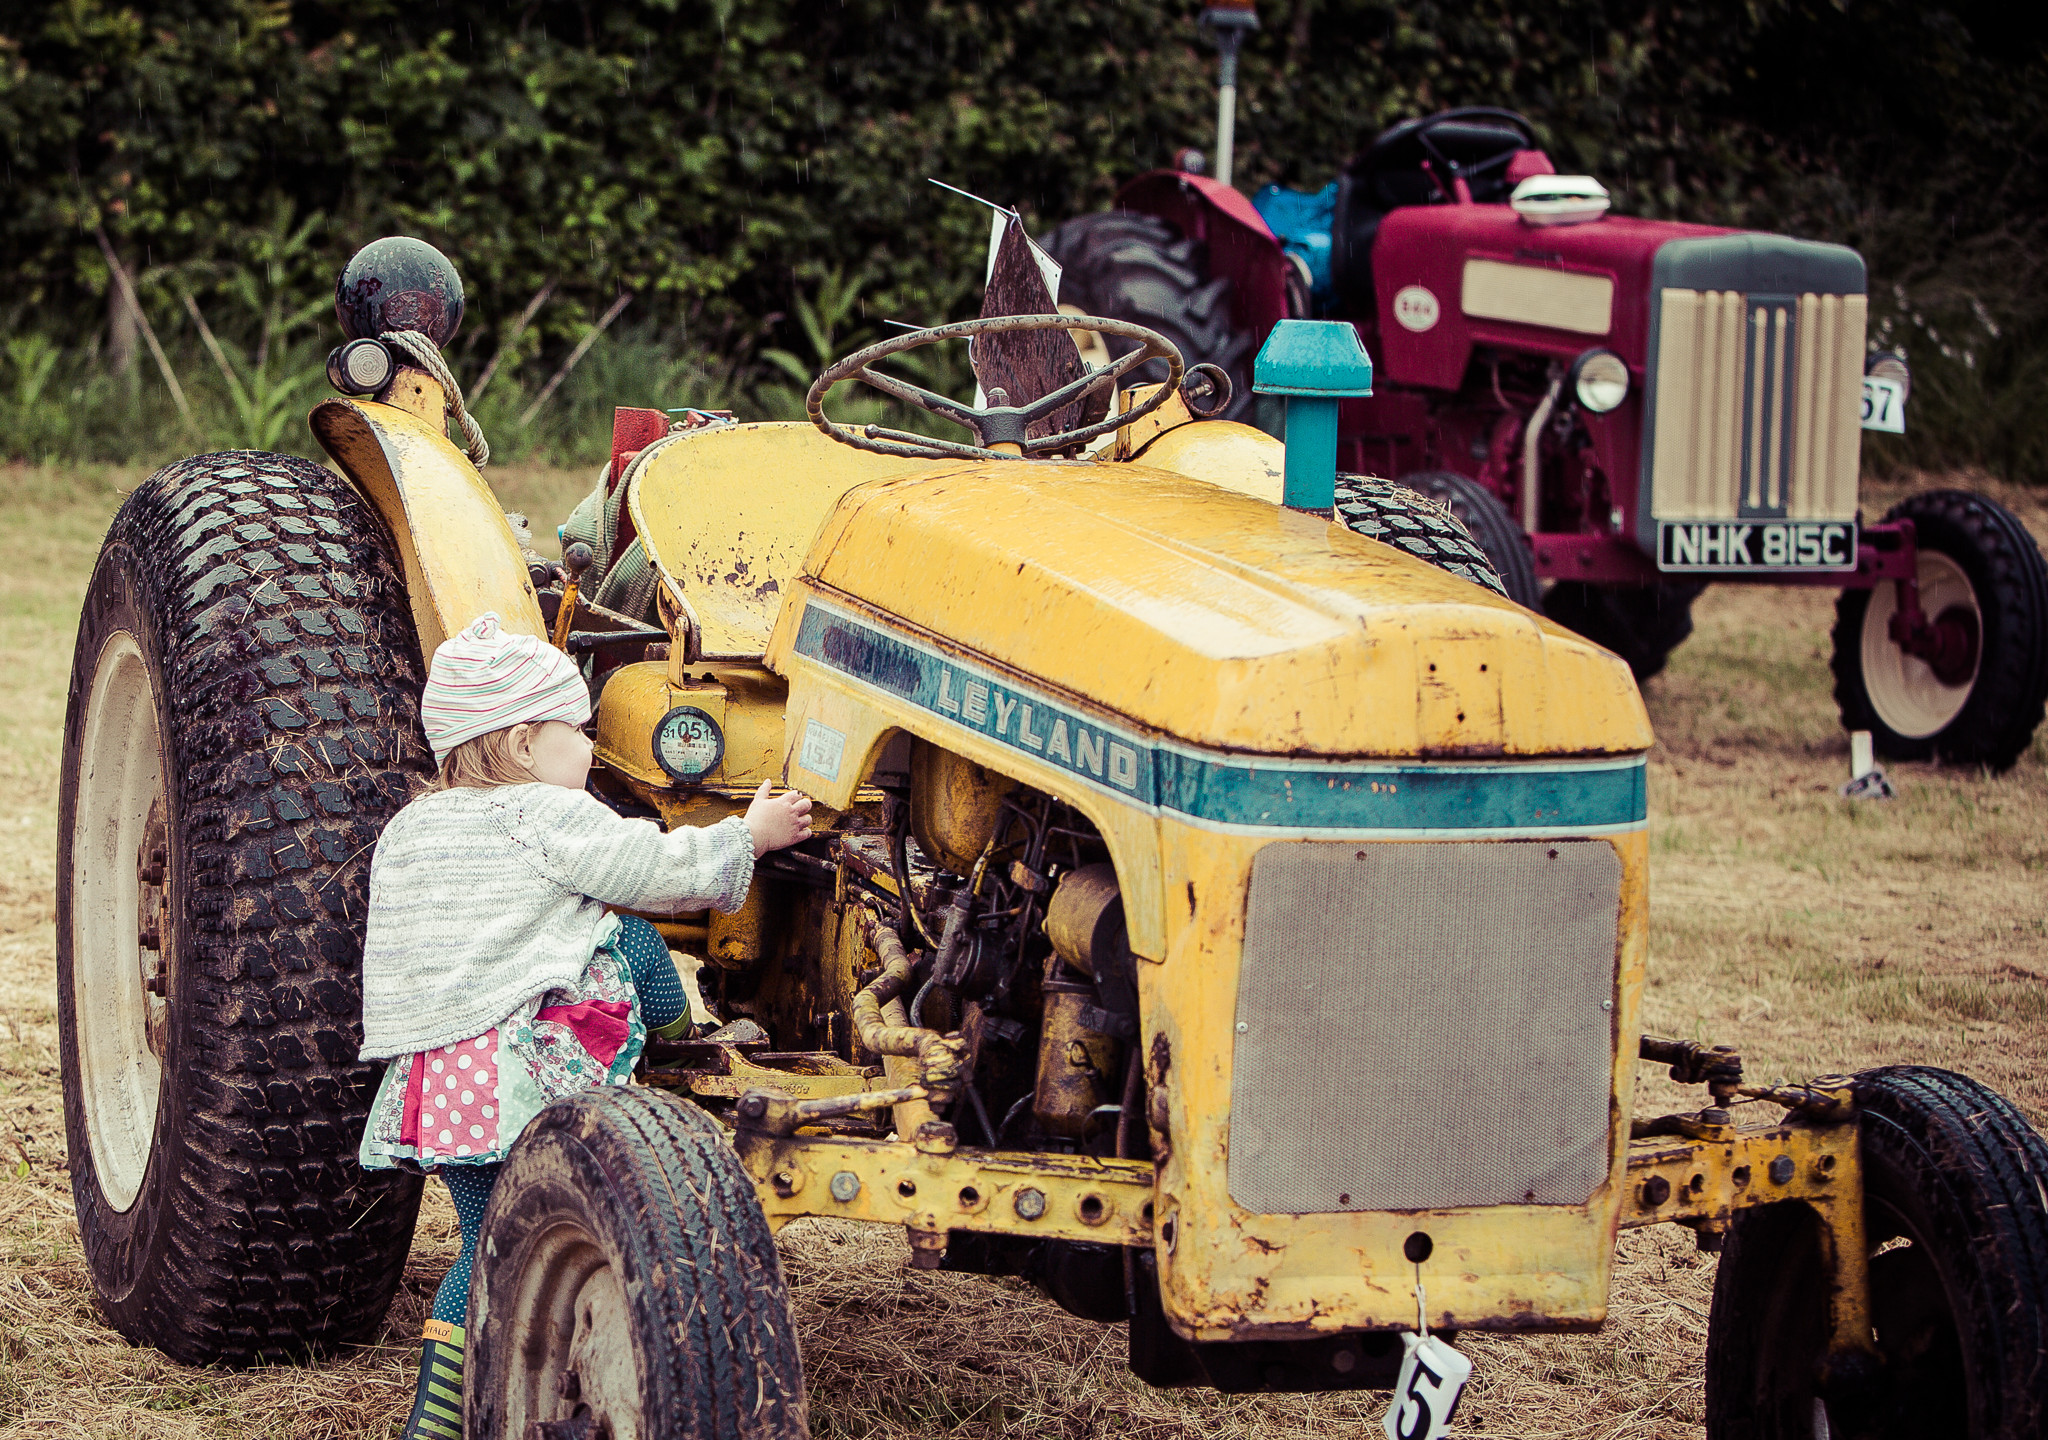 30 days wild tractors